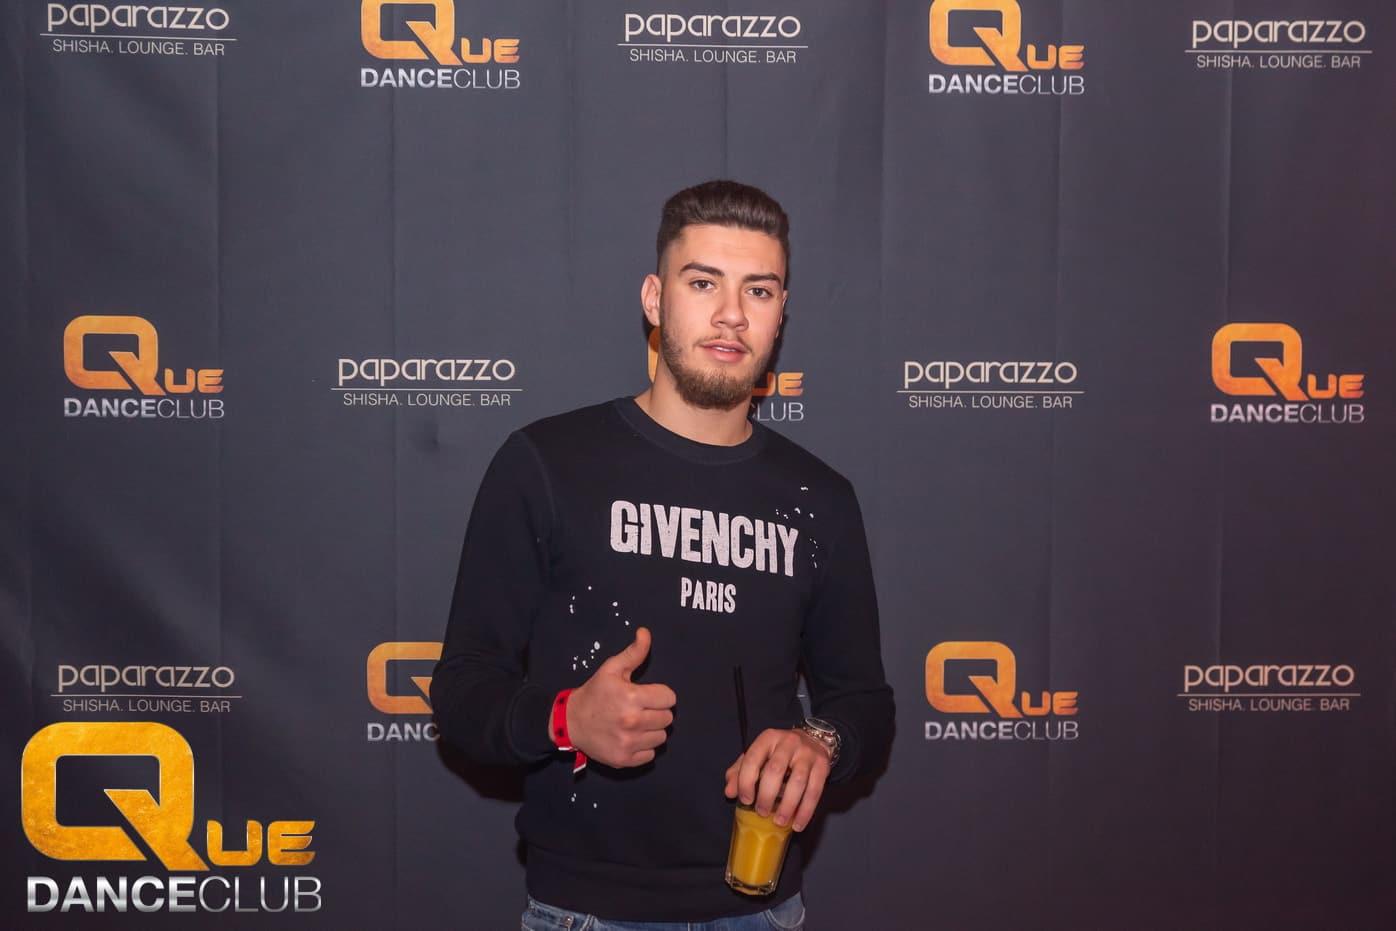 2018_12_08_Que_Danceclub_Paparazzo_Night_Ardian_Bujupi_Live_Nightlife_Scene_Timo_010